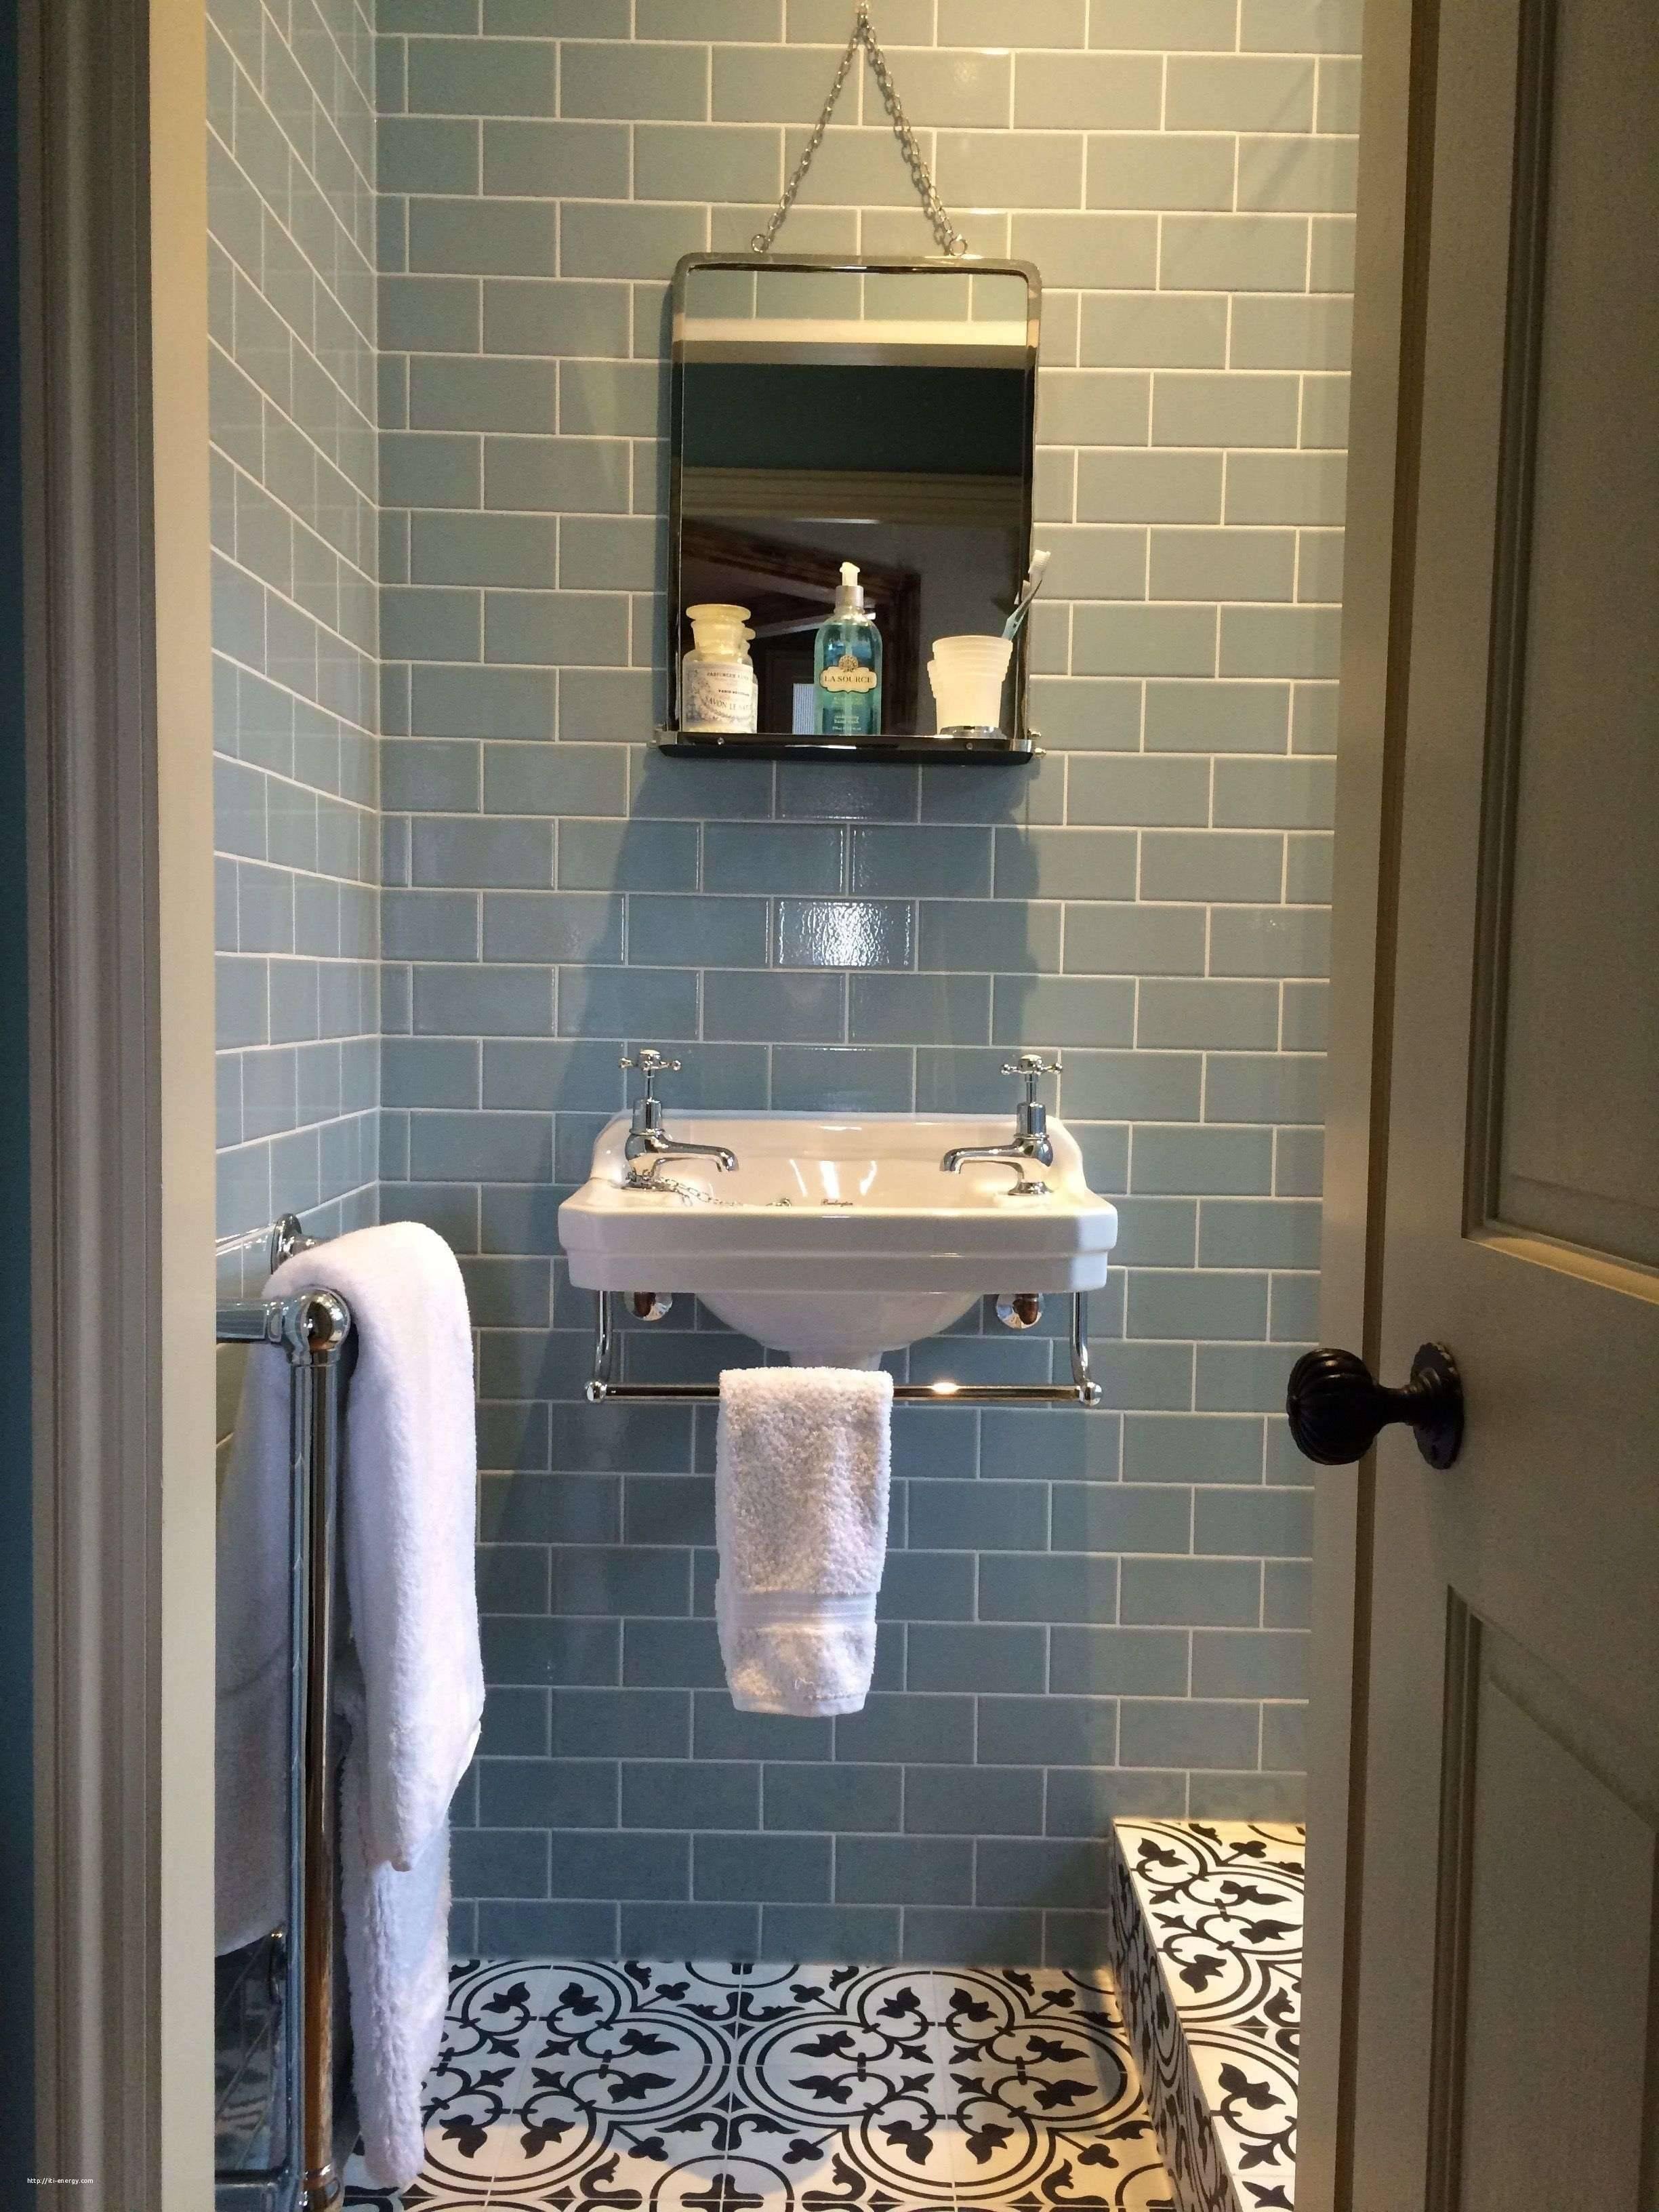 bathroom remodel ideas master small new new colors for master bathroom of bathroom remodel ideas master small